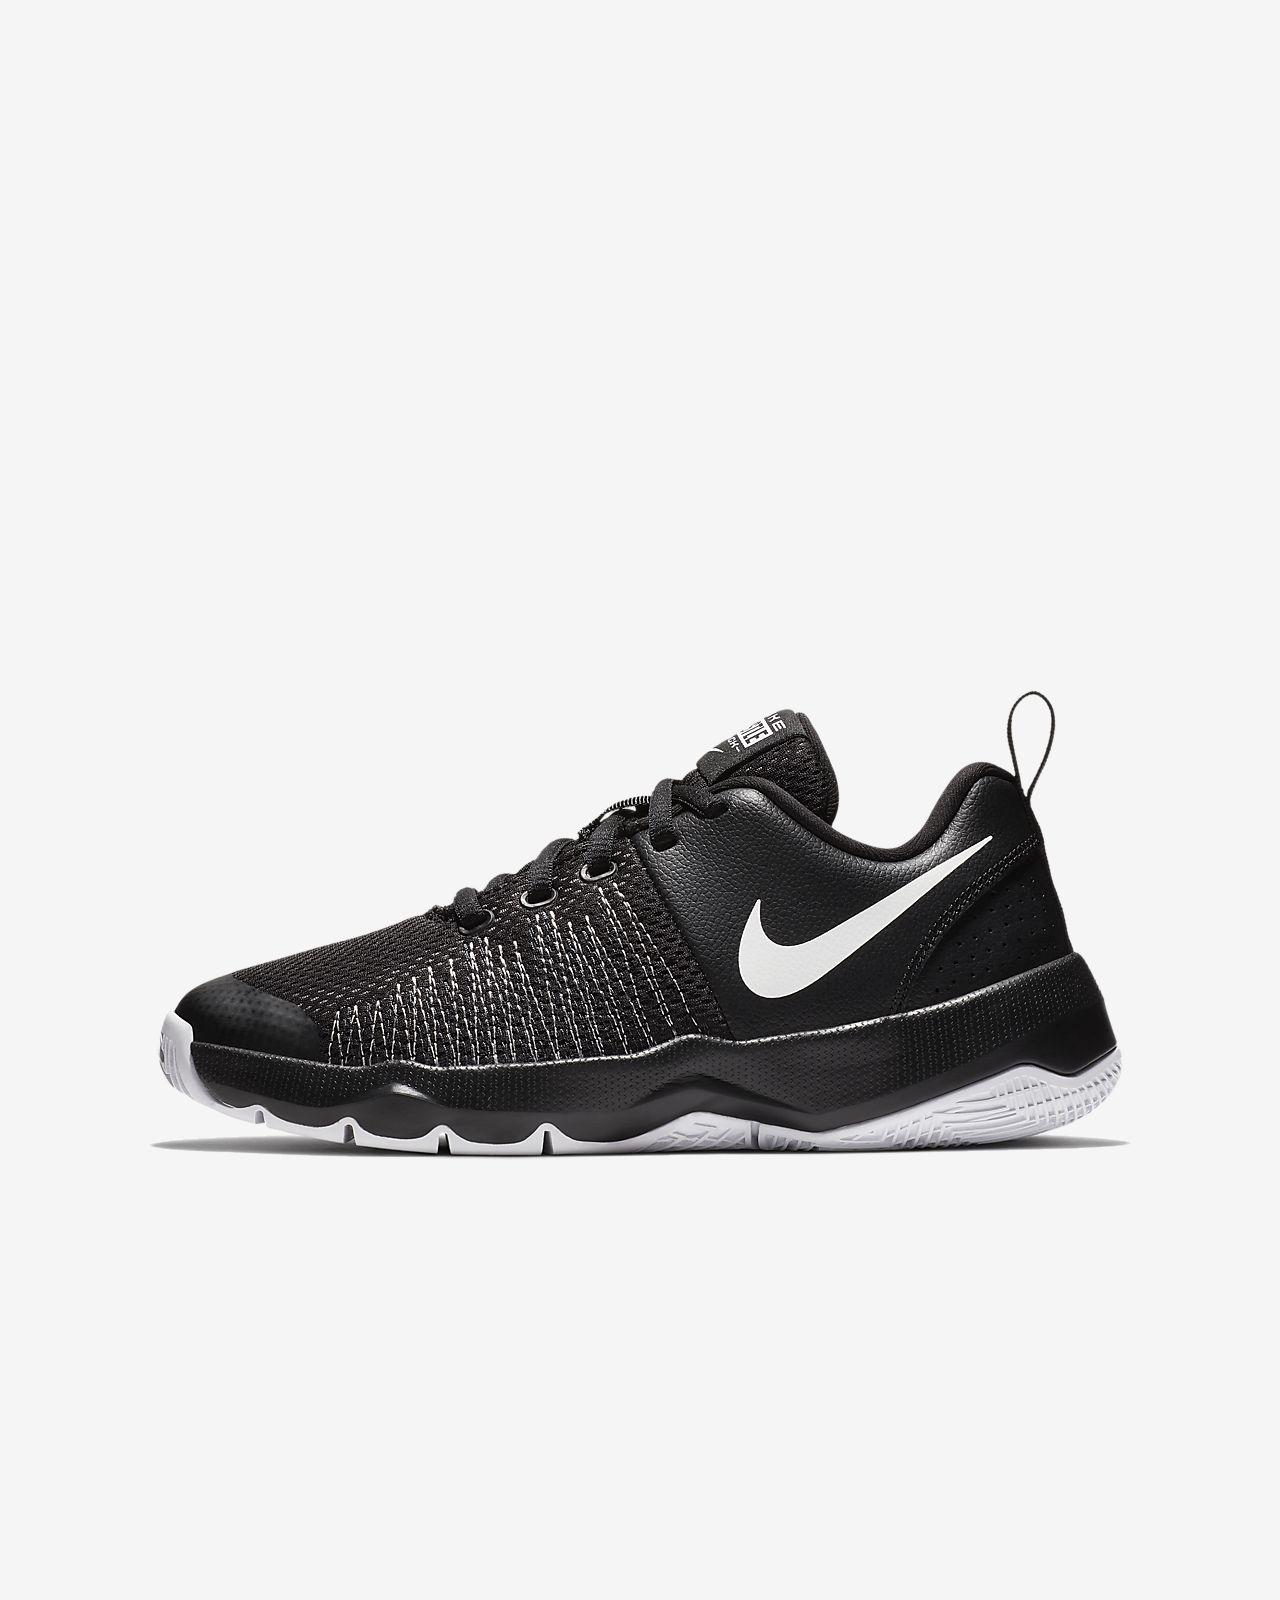 Nike Team Hustle Quick Big Kids' Basketball Shoe